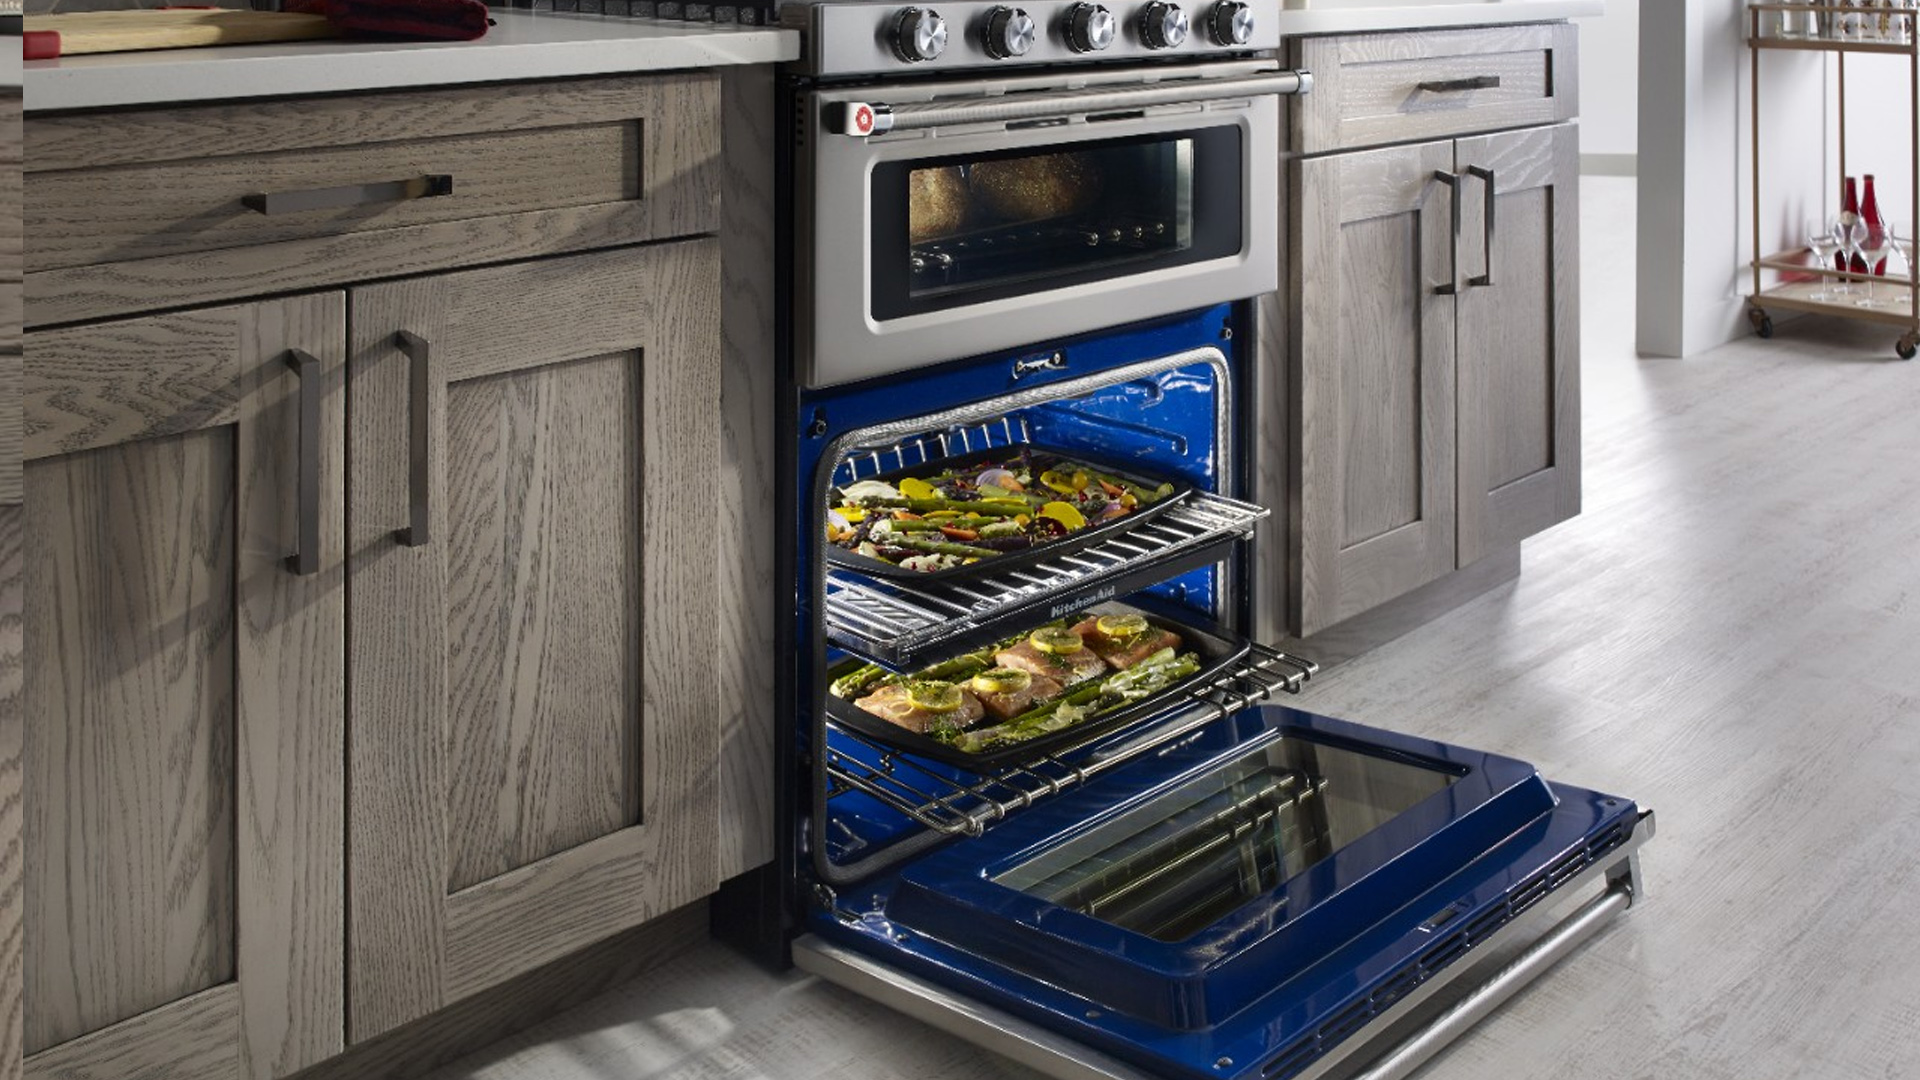 KitchenAid Induction Double Oven Range Repair | KitchenAid Repairs